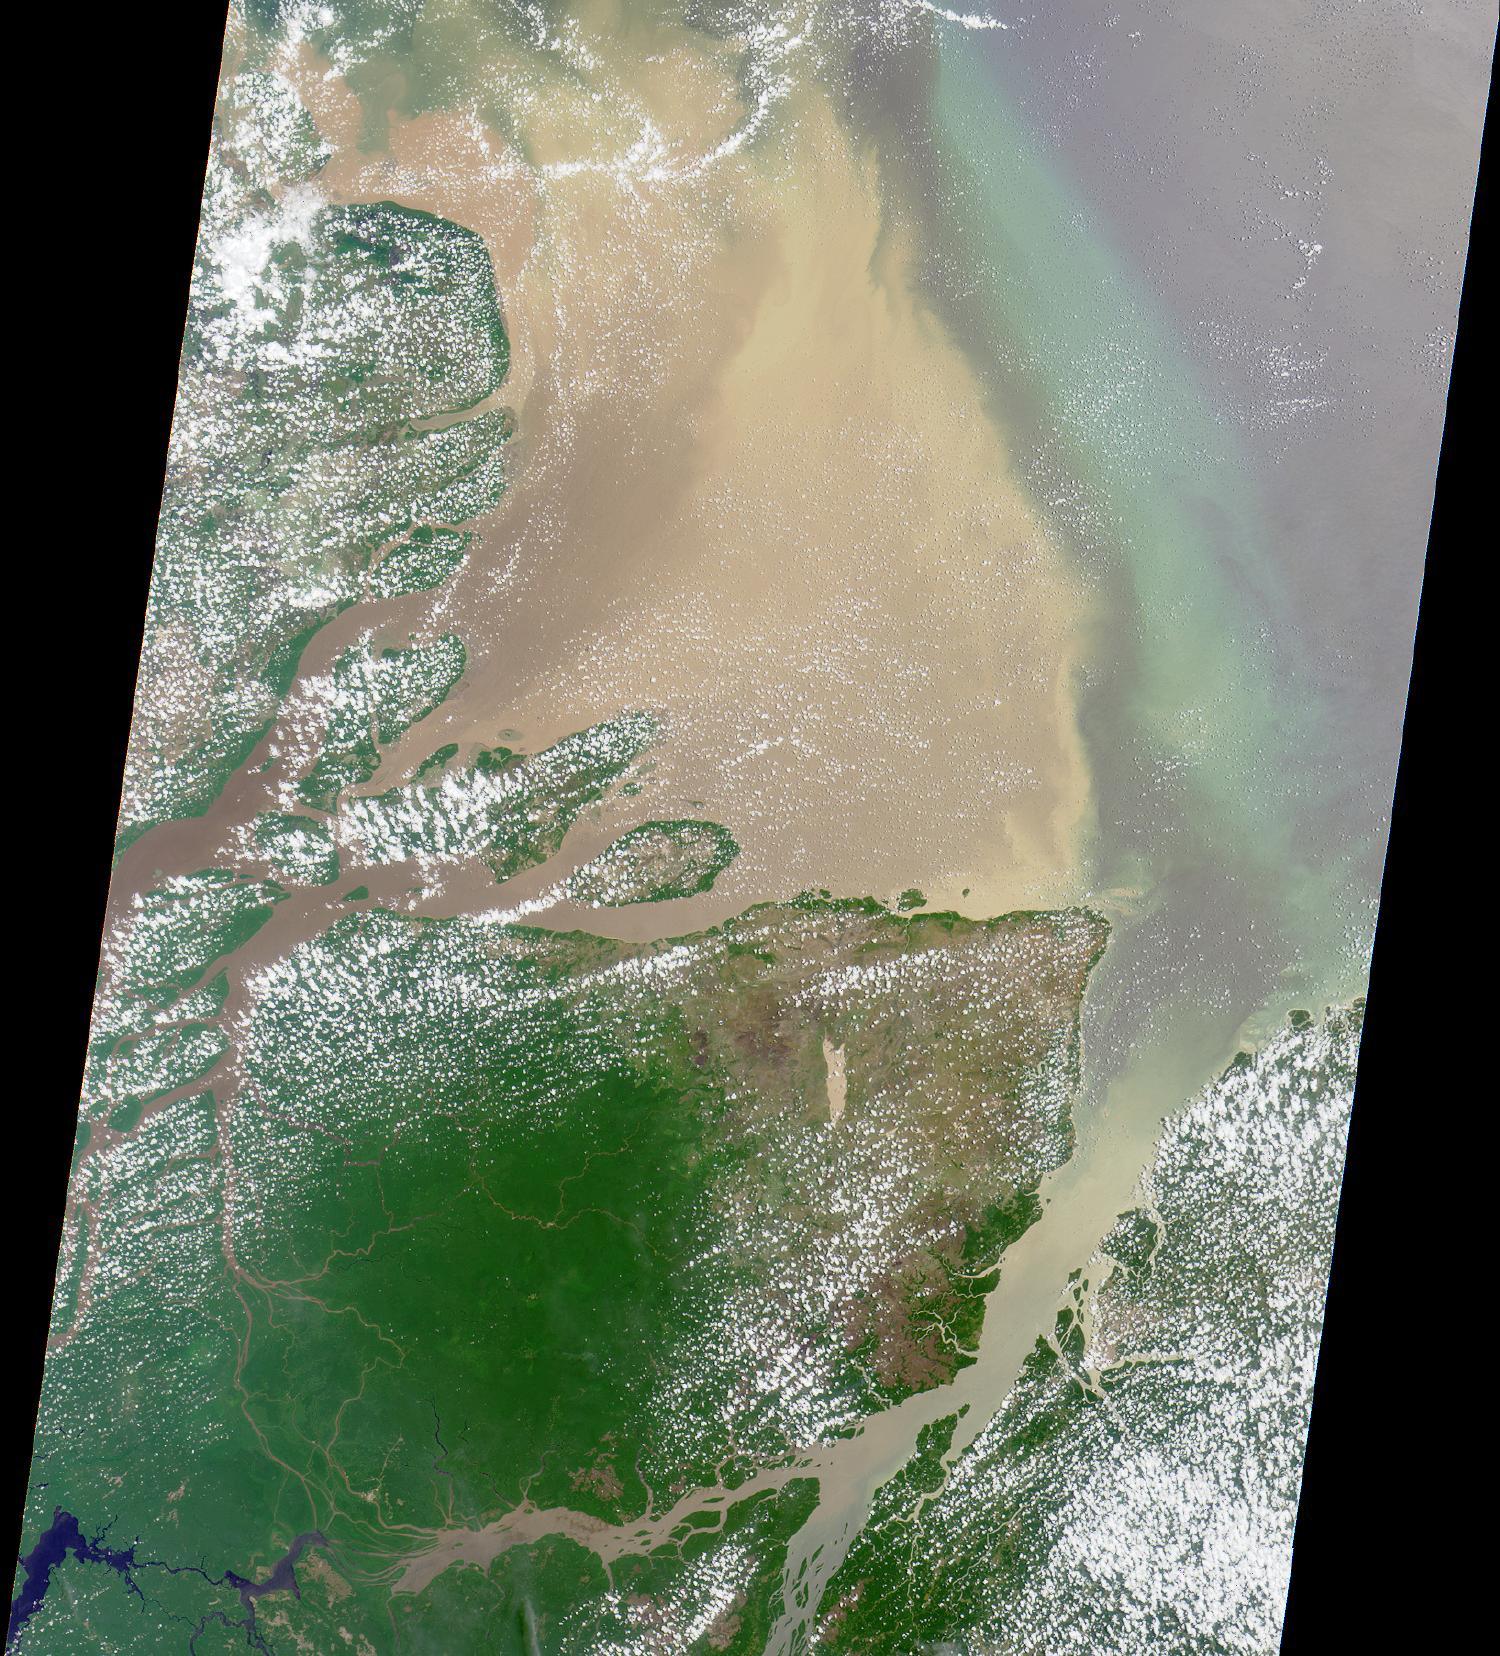 Amazon River's Mouth Satellite Photo, Brazil